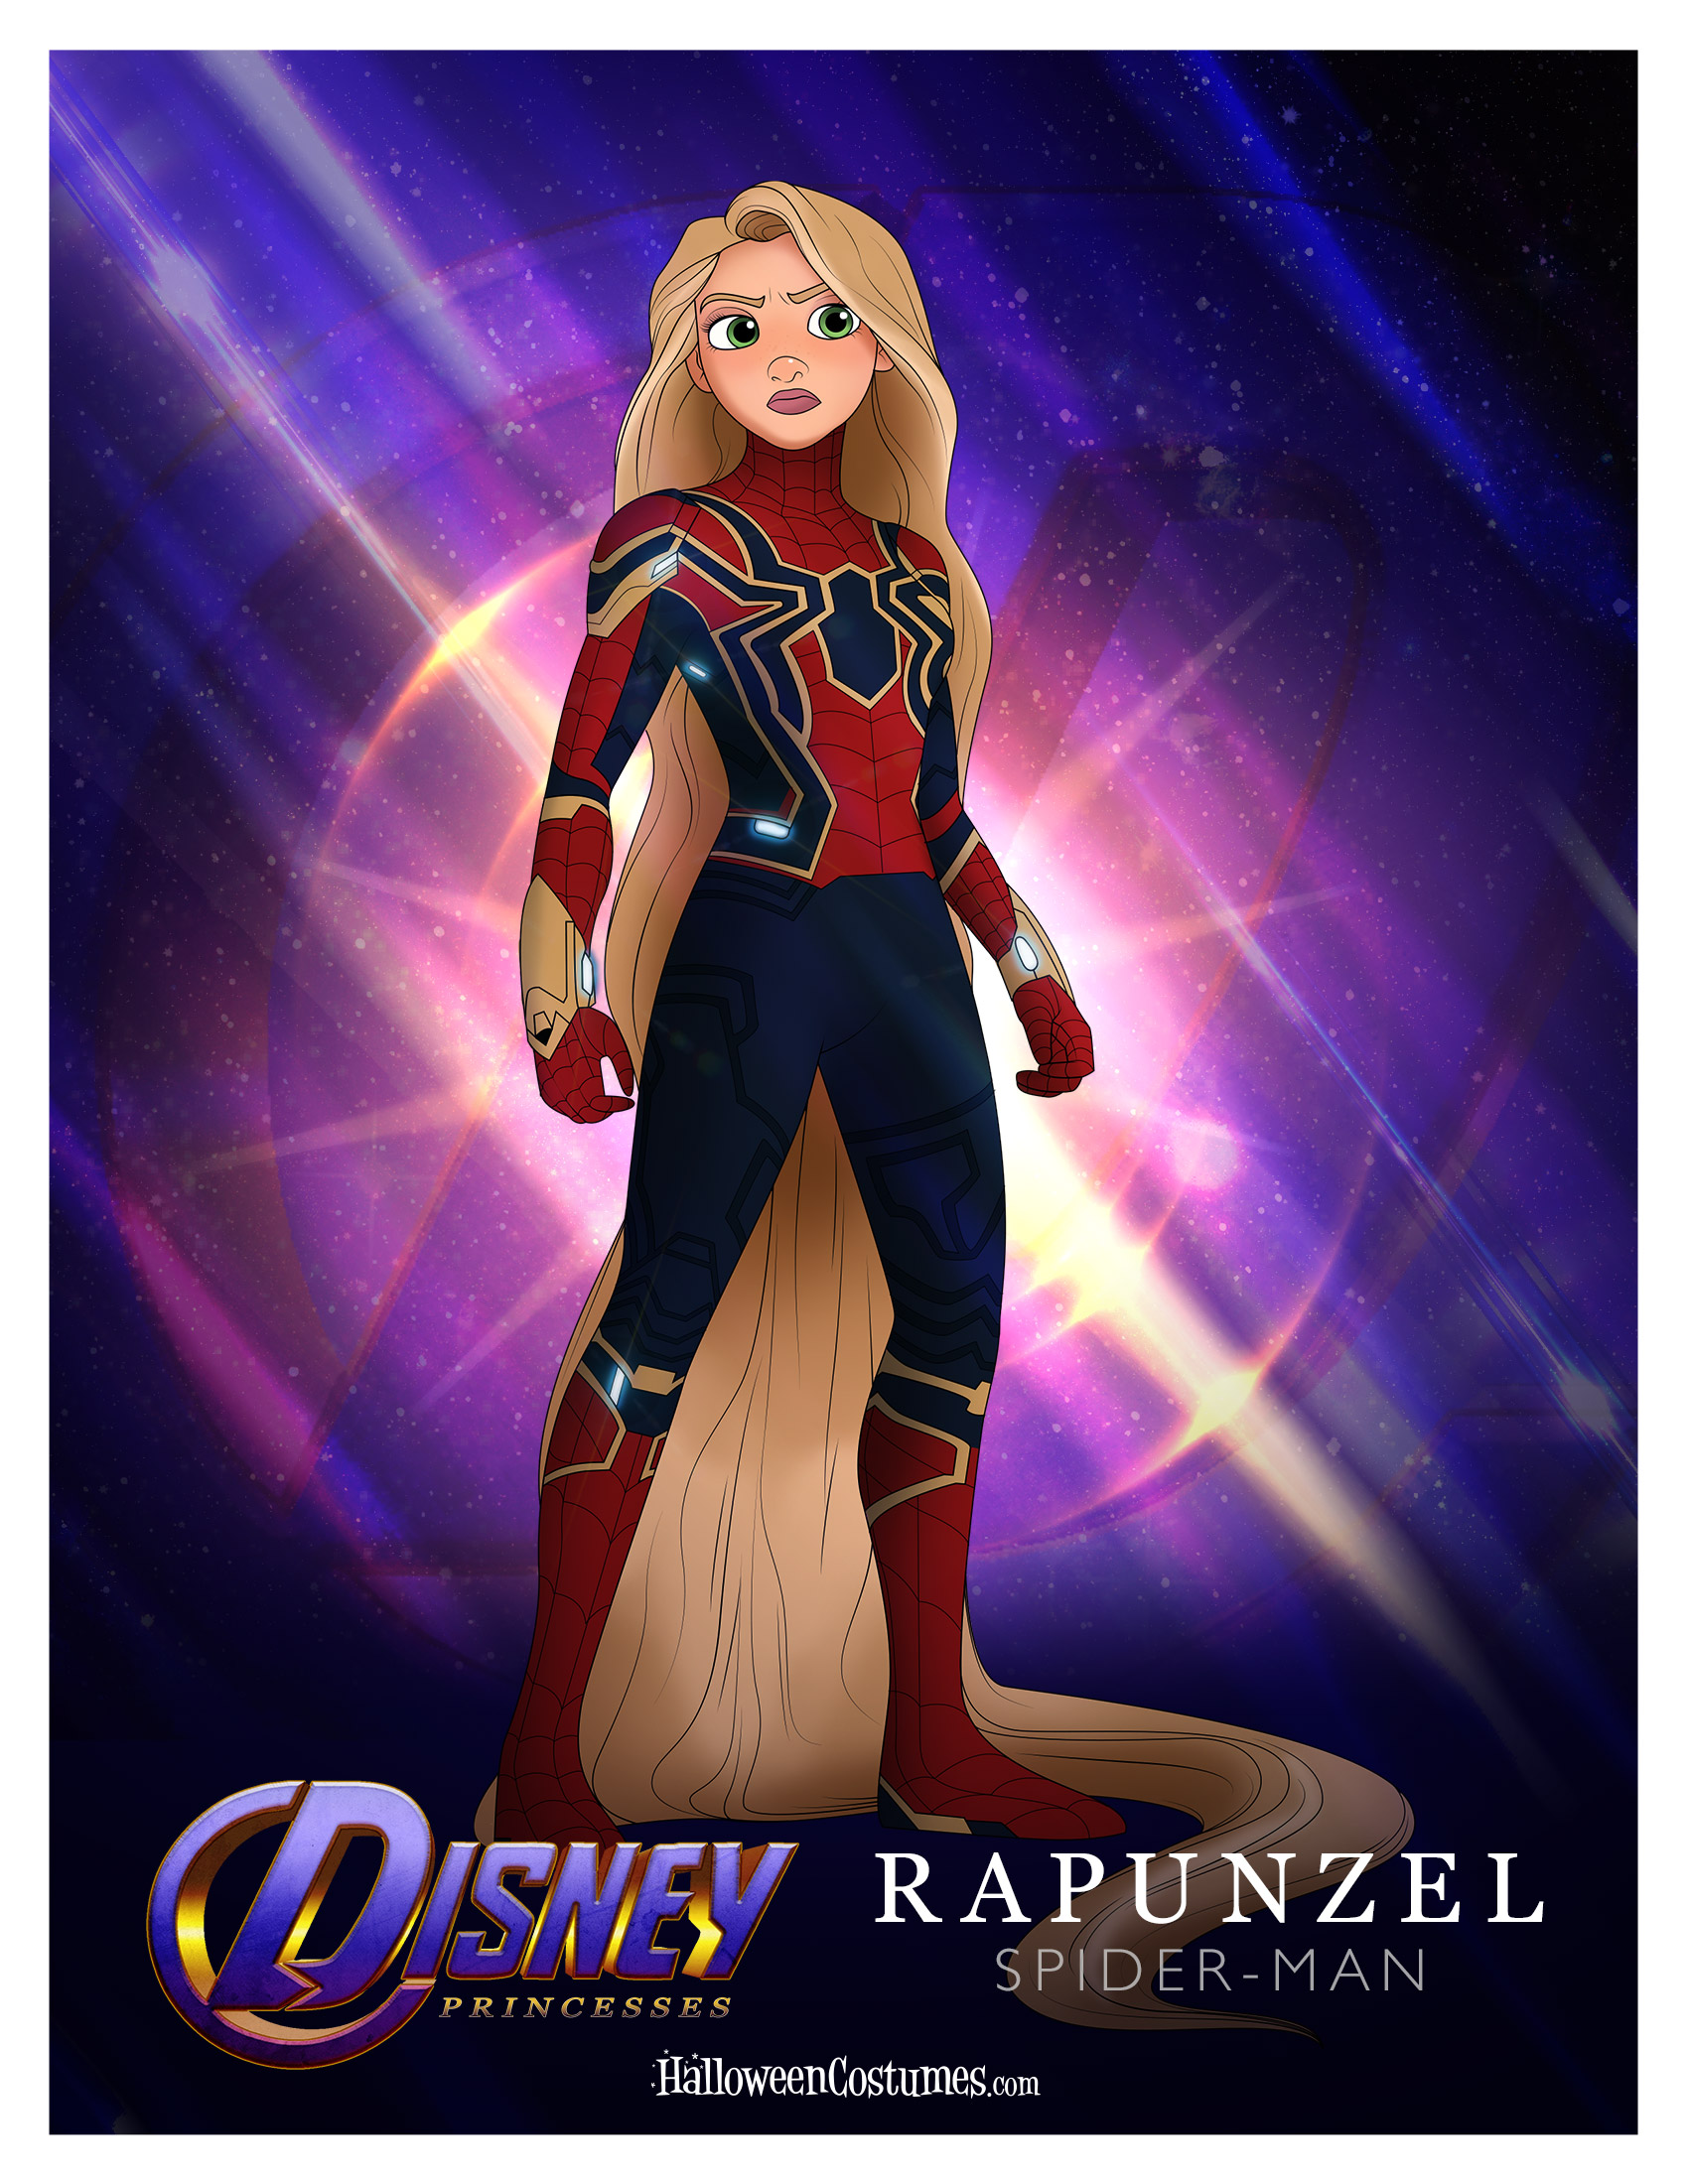 Princess Rapunzel as Spider-Man